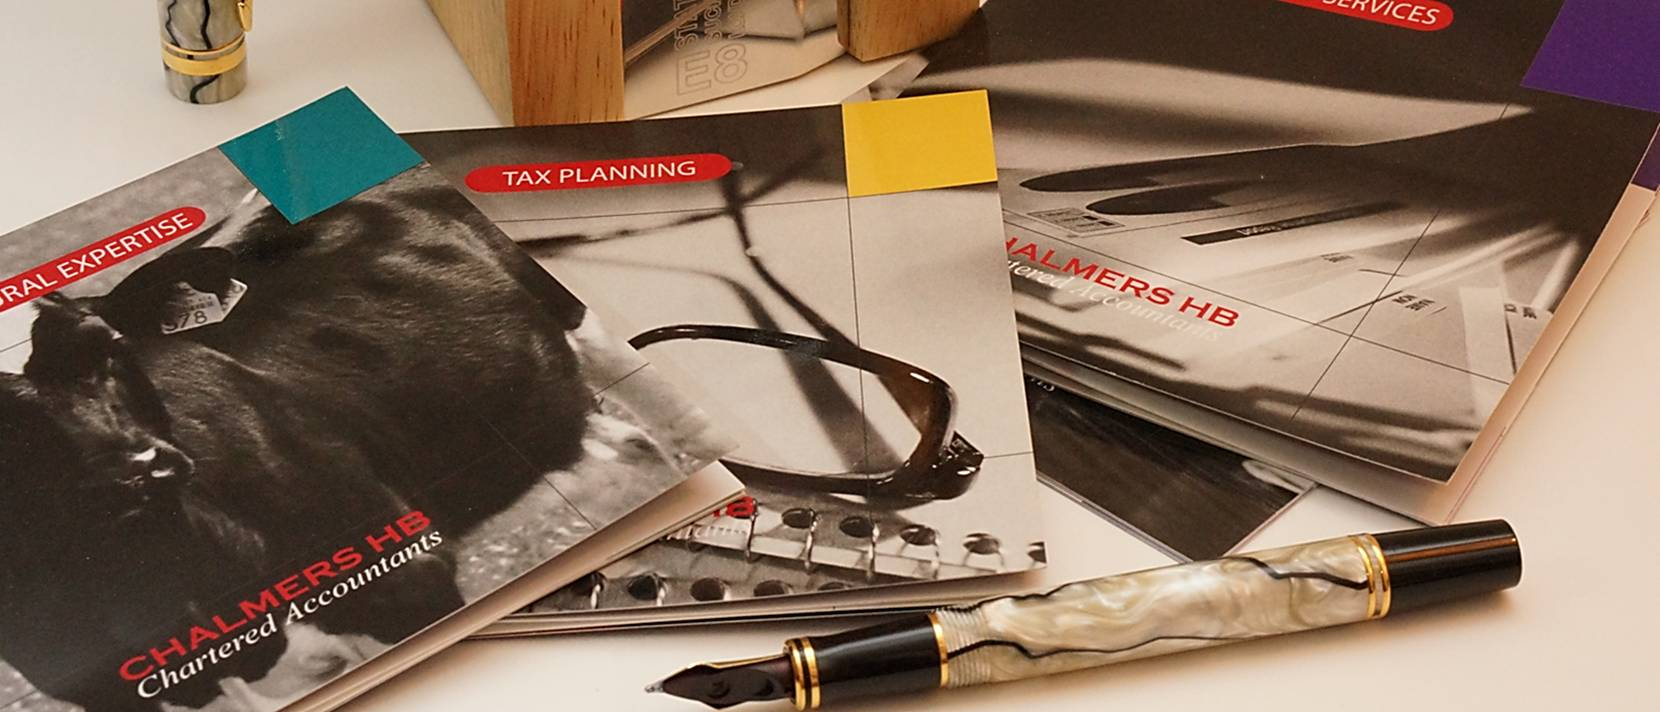 stationary, ink pen, glasses